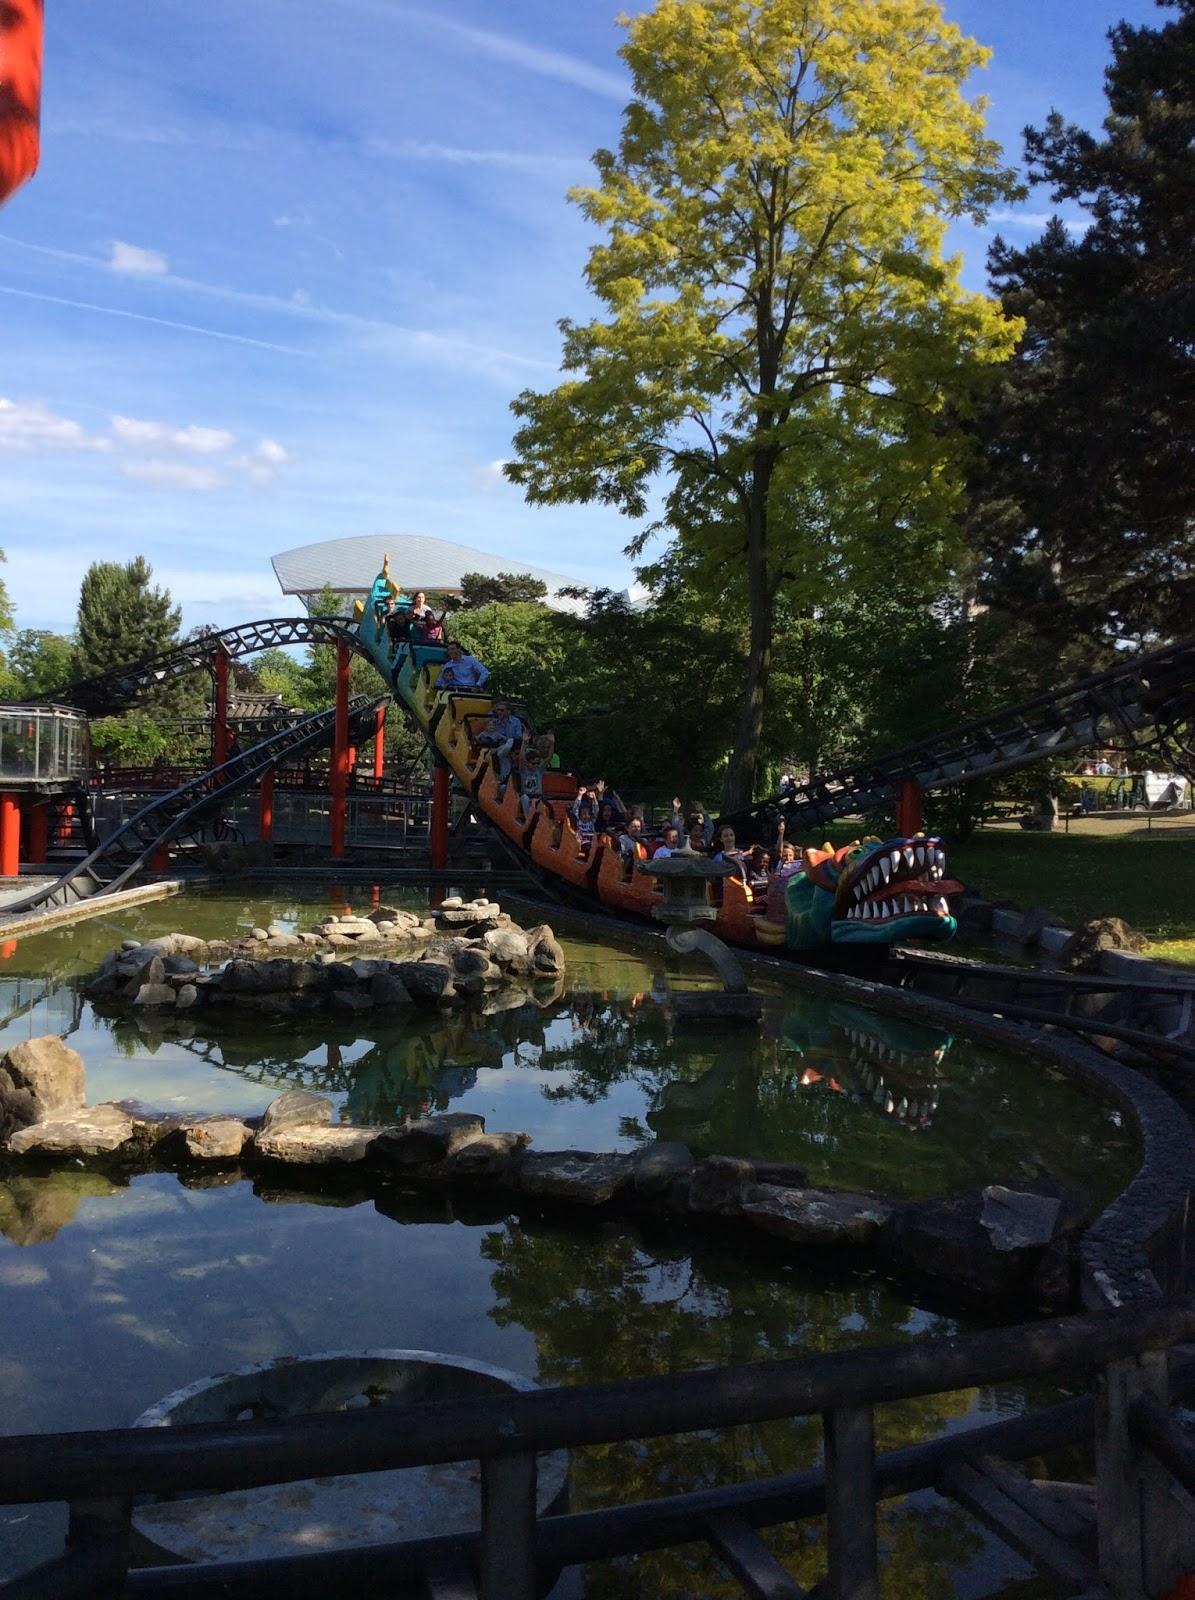 Globeshoppeuse le jardin d 39 acclimatation paradis des petits for Le jardin neuilly